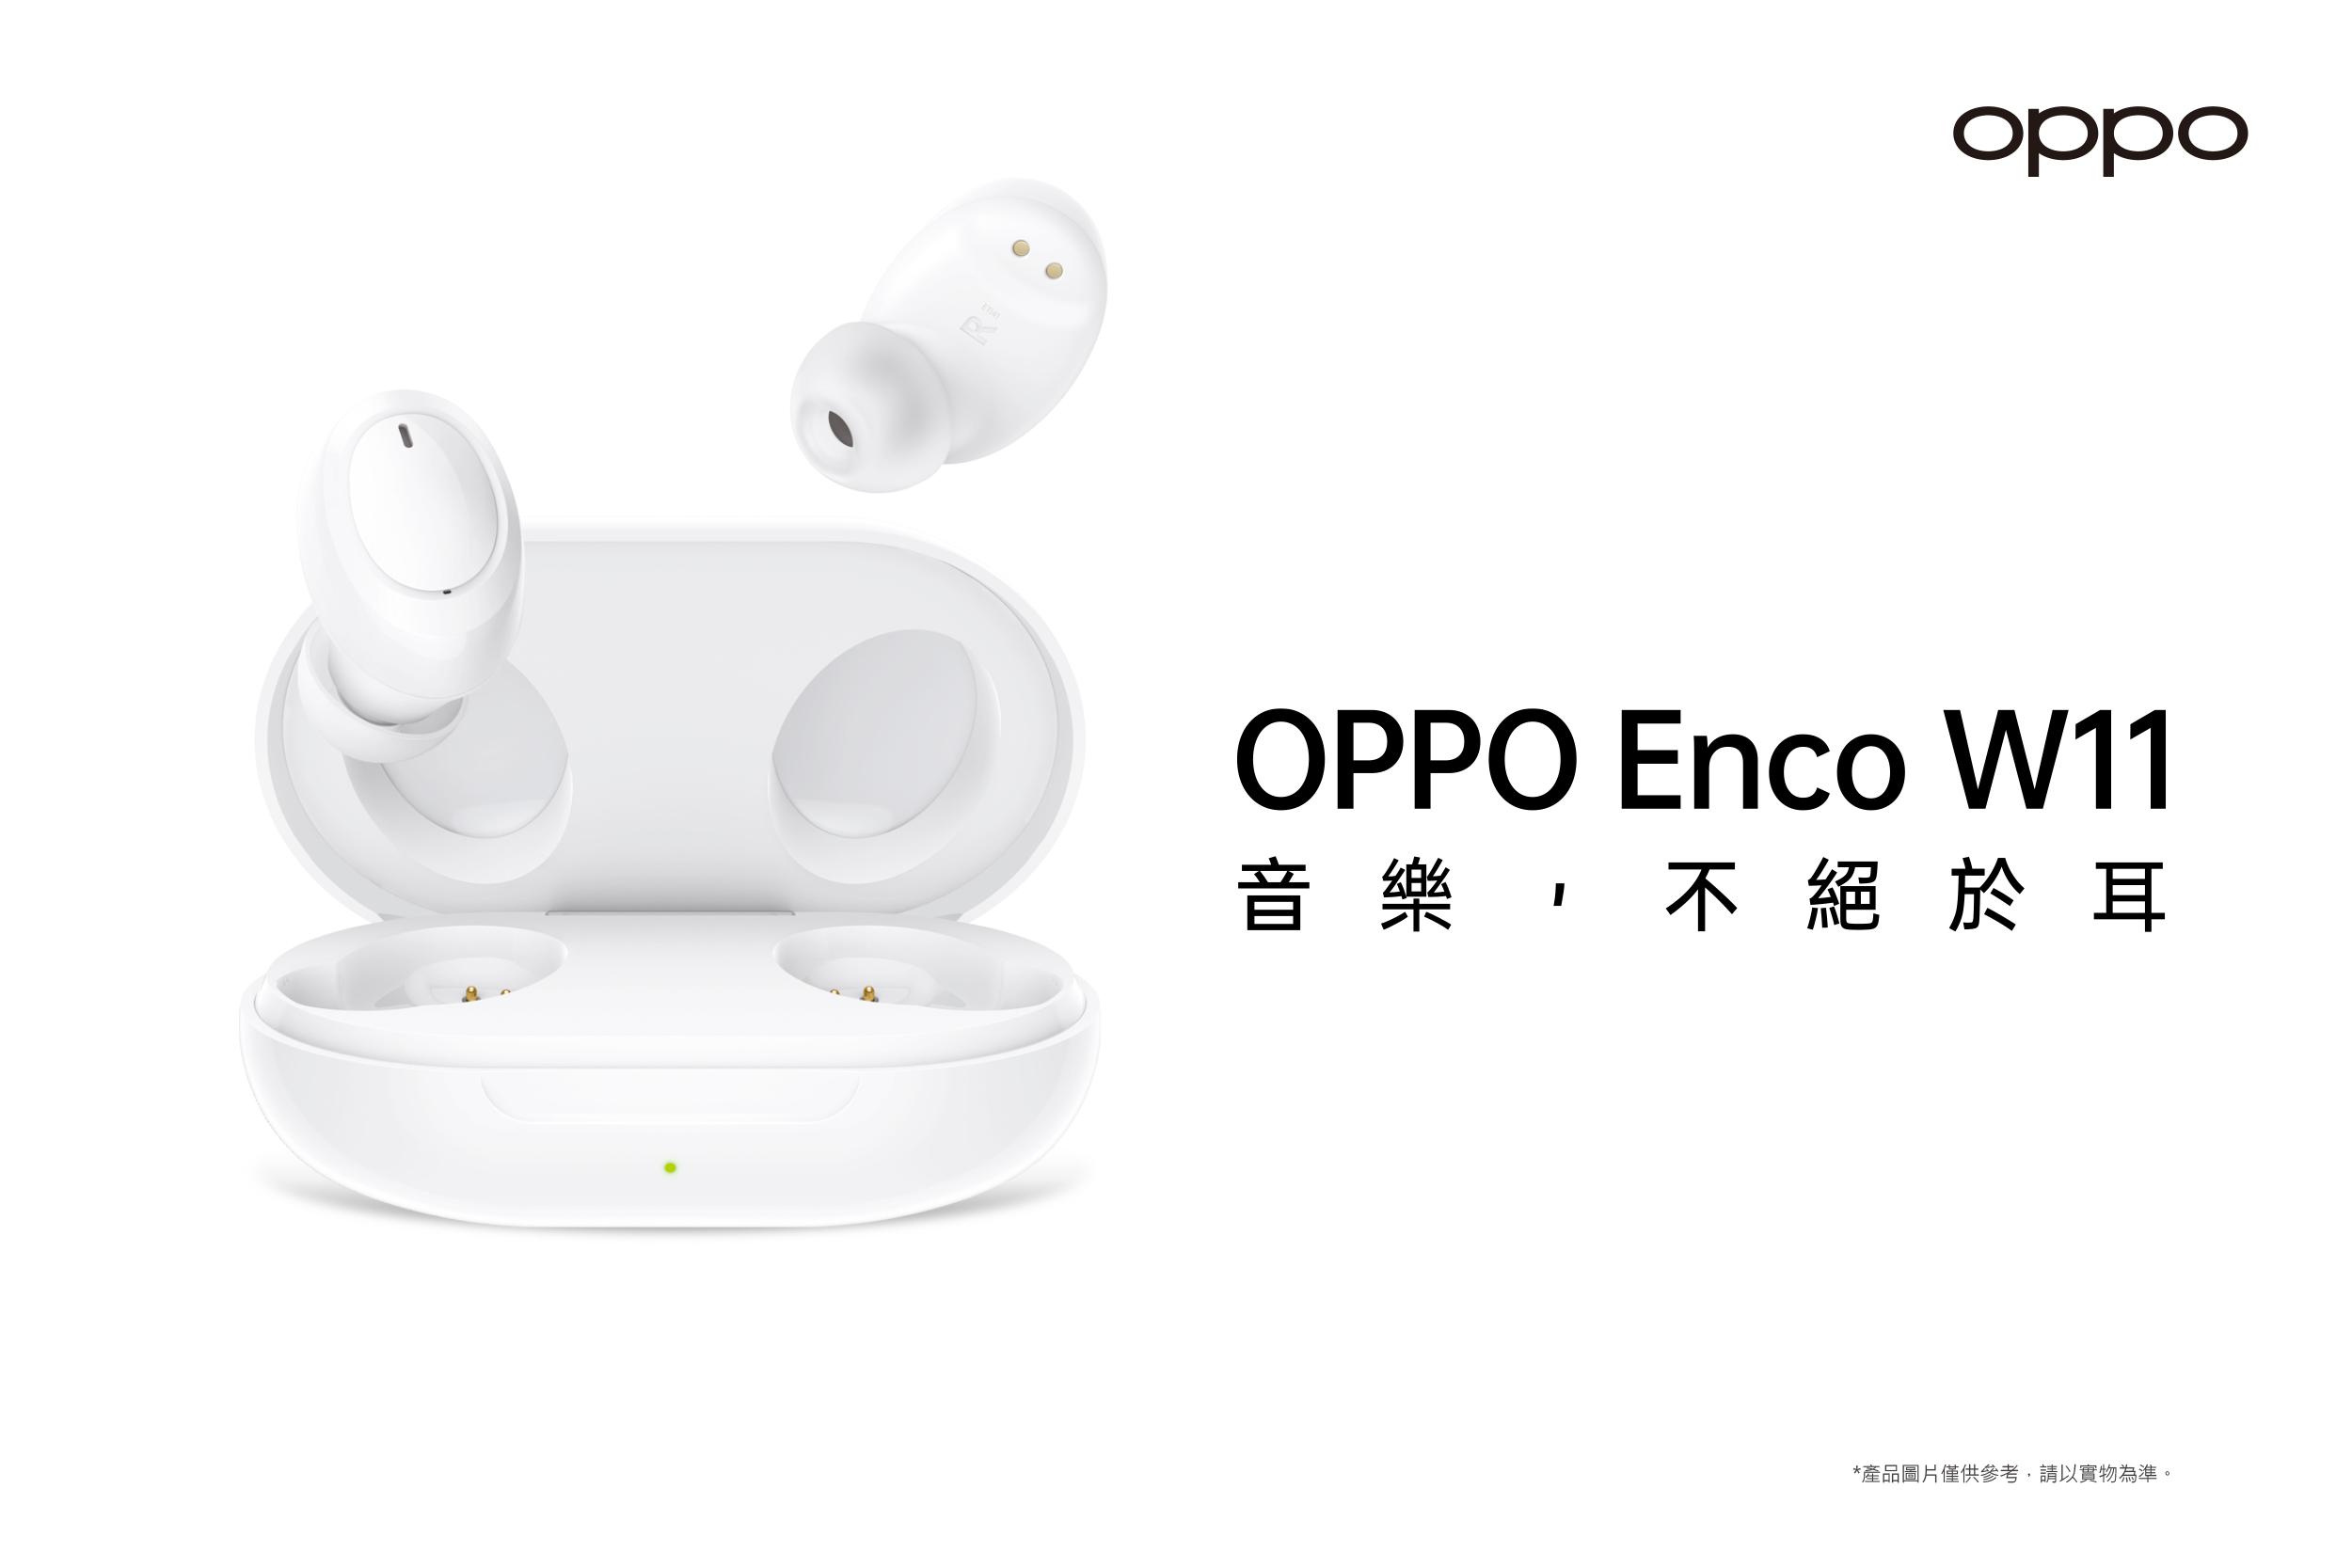 OPPO今(7)日宣布推出擁有20小時超長續航力與IP55防塵防水等級的真無線藍牙耳機 OPPO Enco W11。